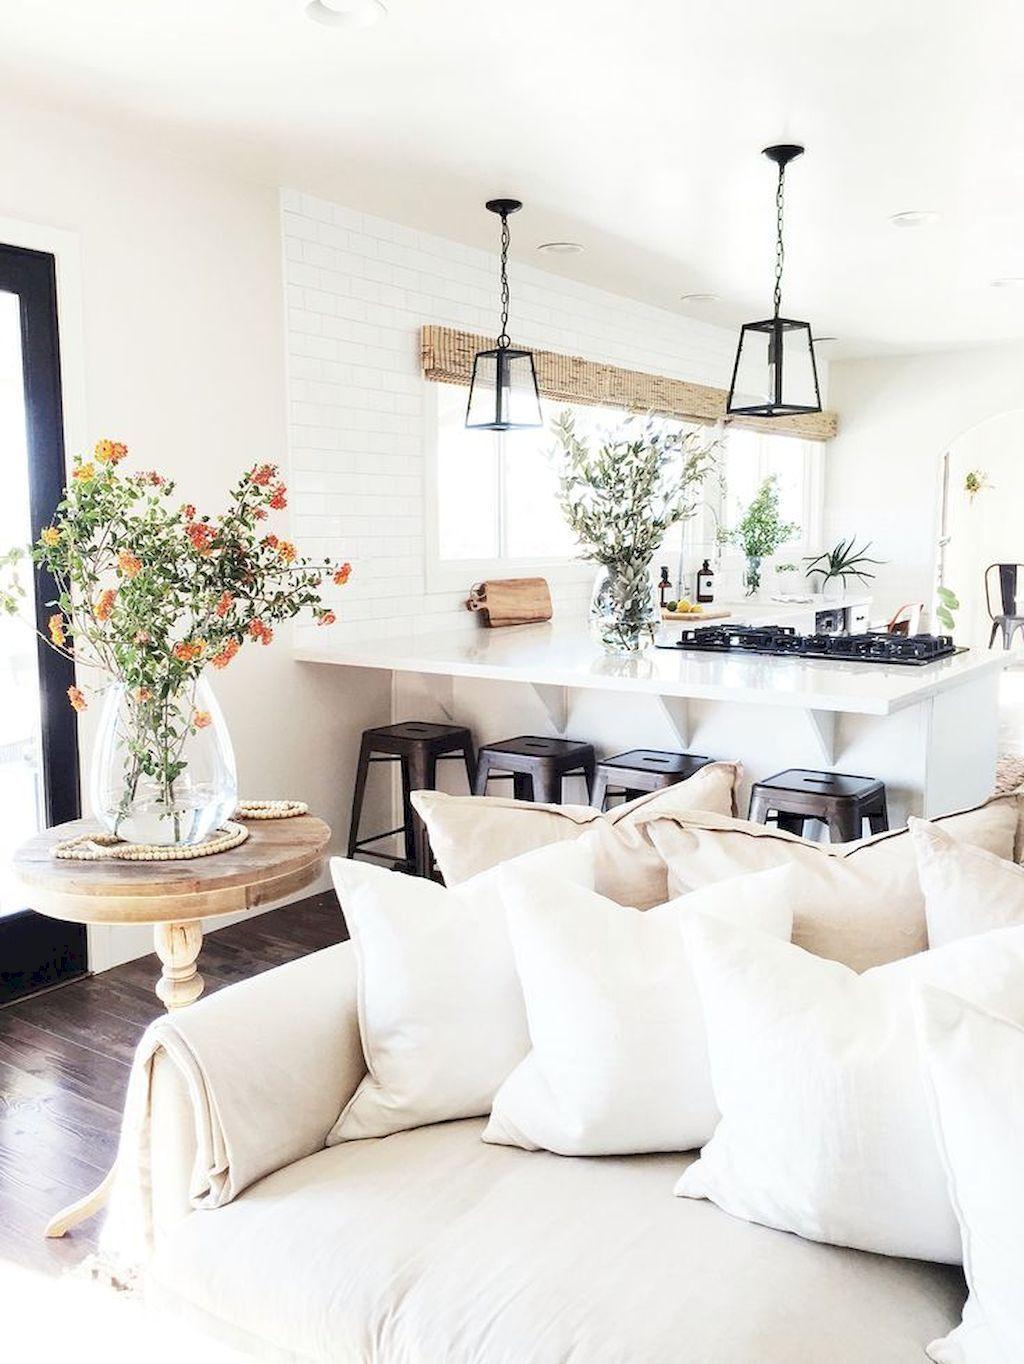 35 Minimalist Living Room Design & Decor Ideas | Small spaces ...